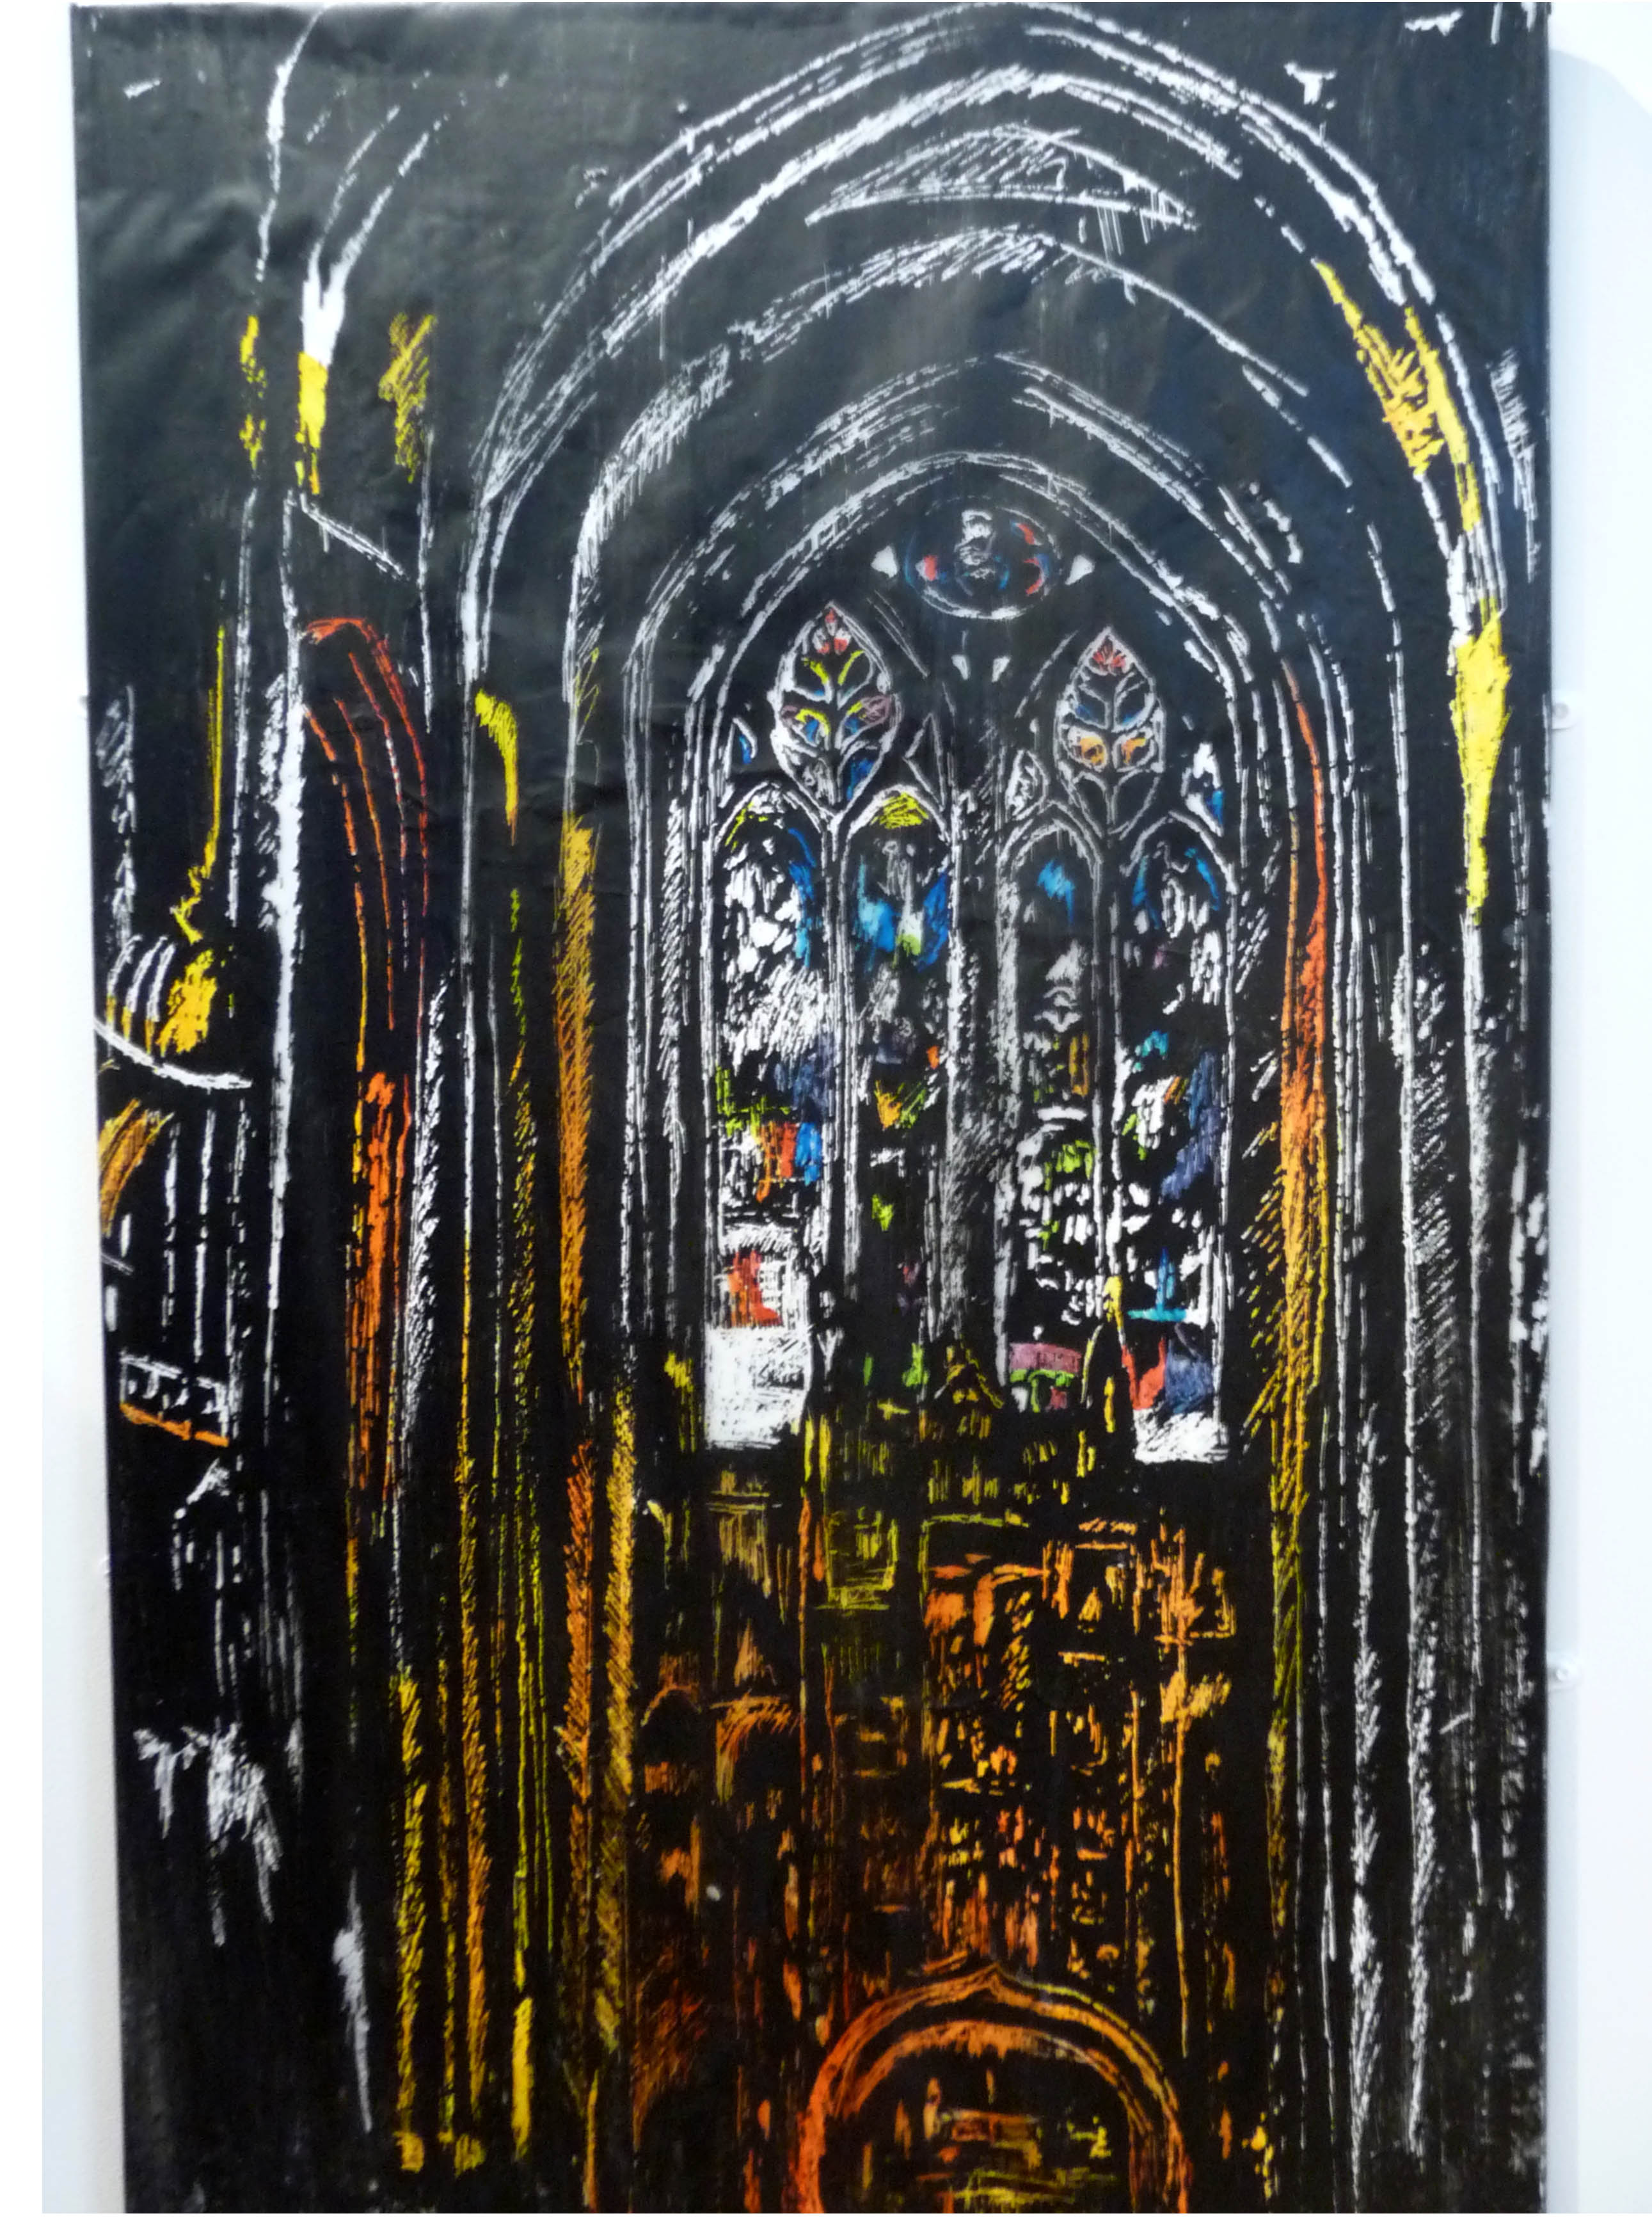 CHURCH INTERIOR, acrylic, by Elizabeth Cavanagh, Liverpool Hope Univ Art Degree Show 2014